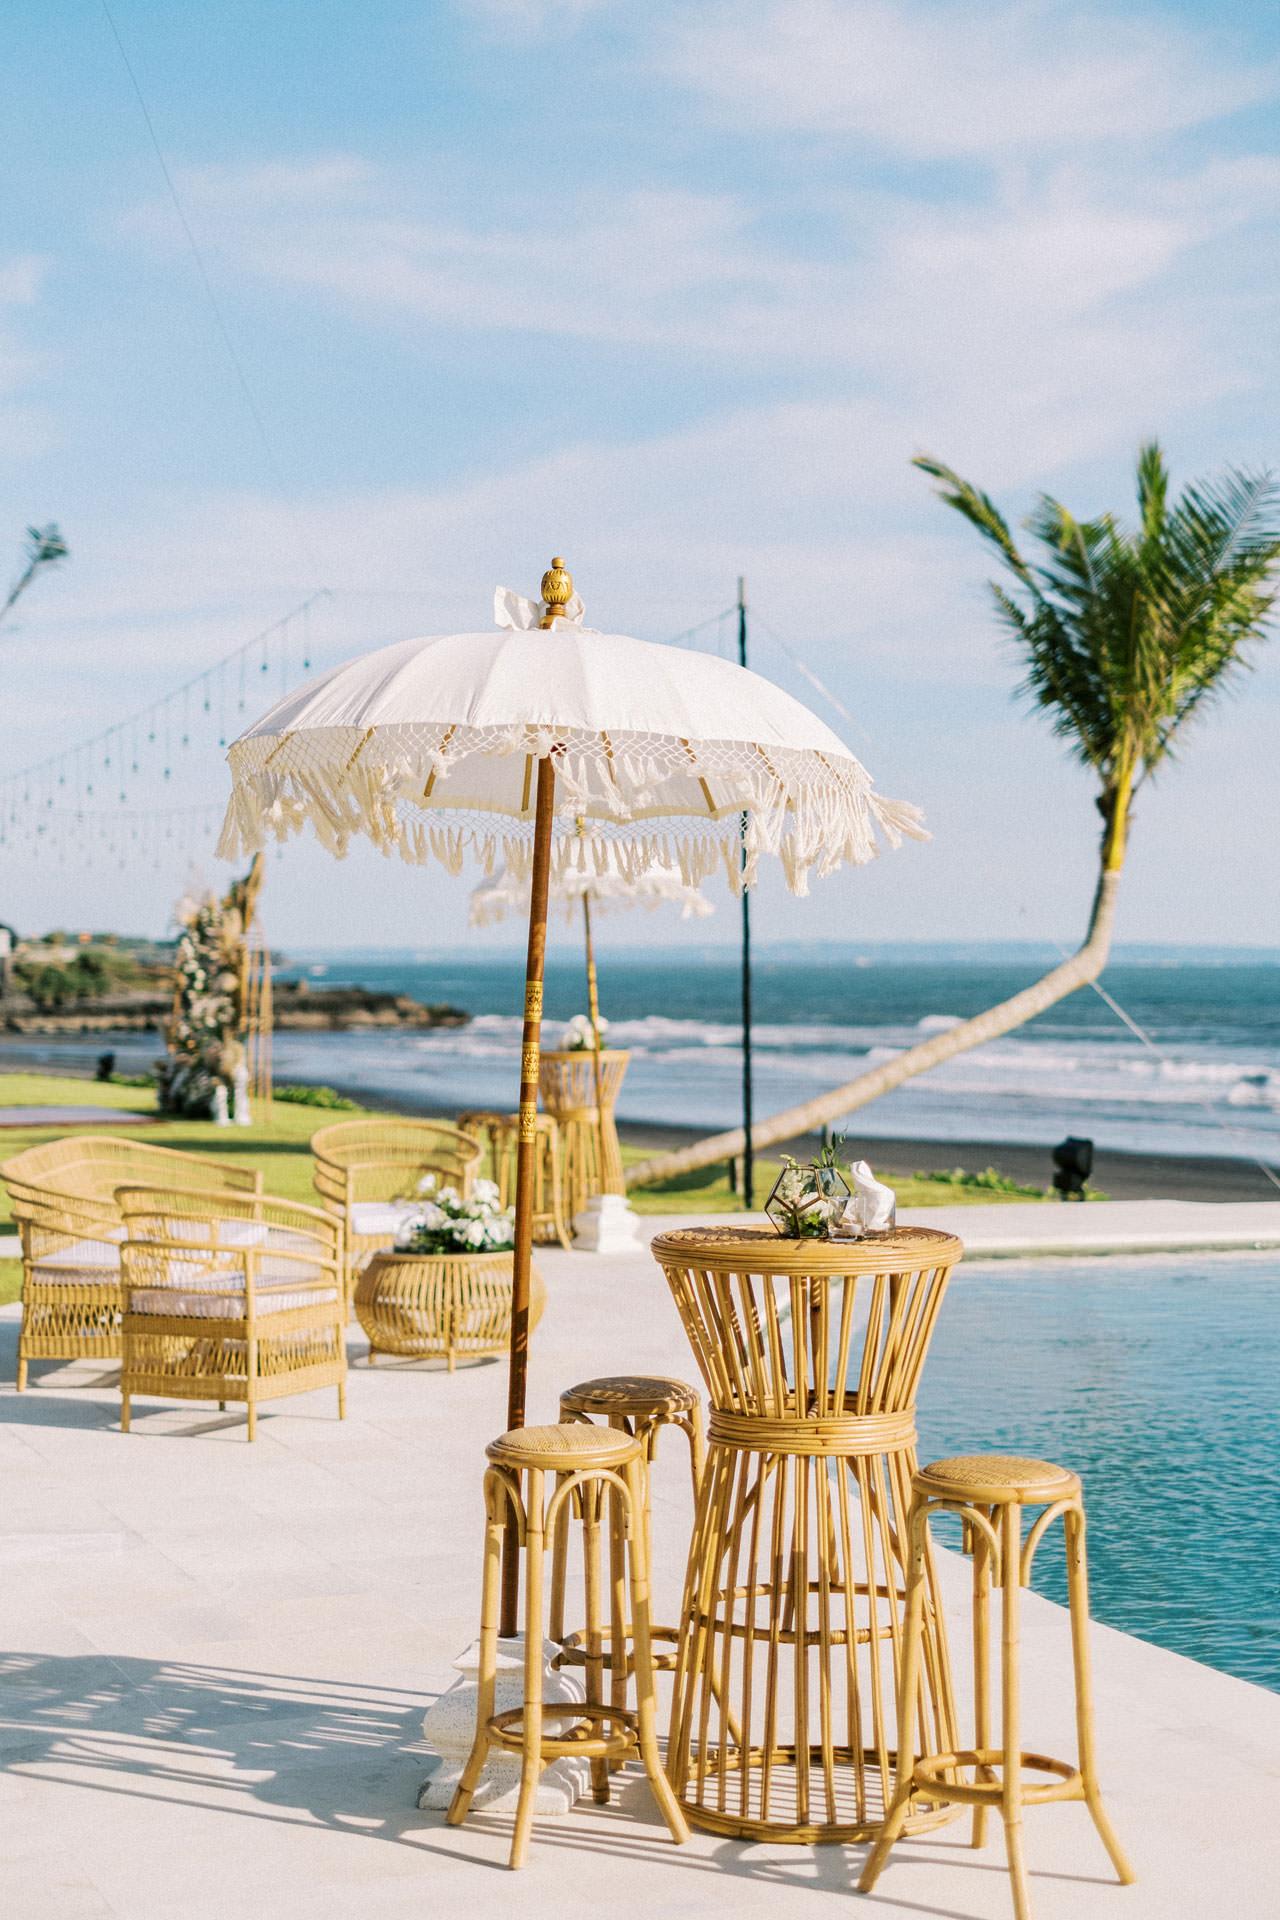 Bali Beach Glamping Wedding on a Luxury Tent 18